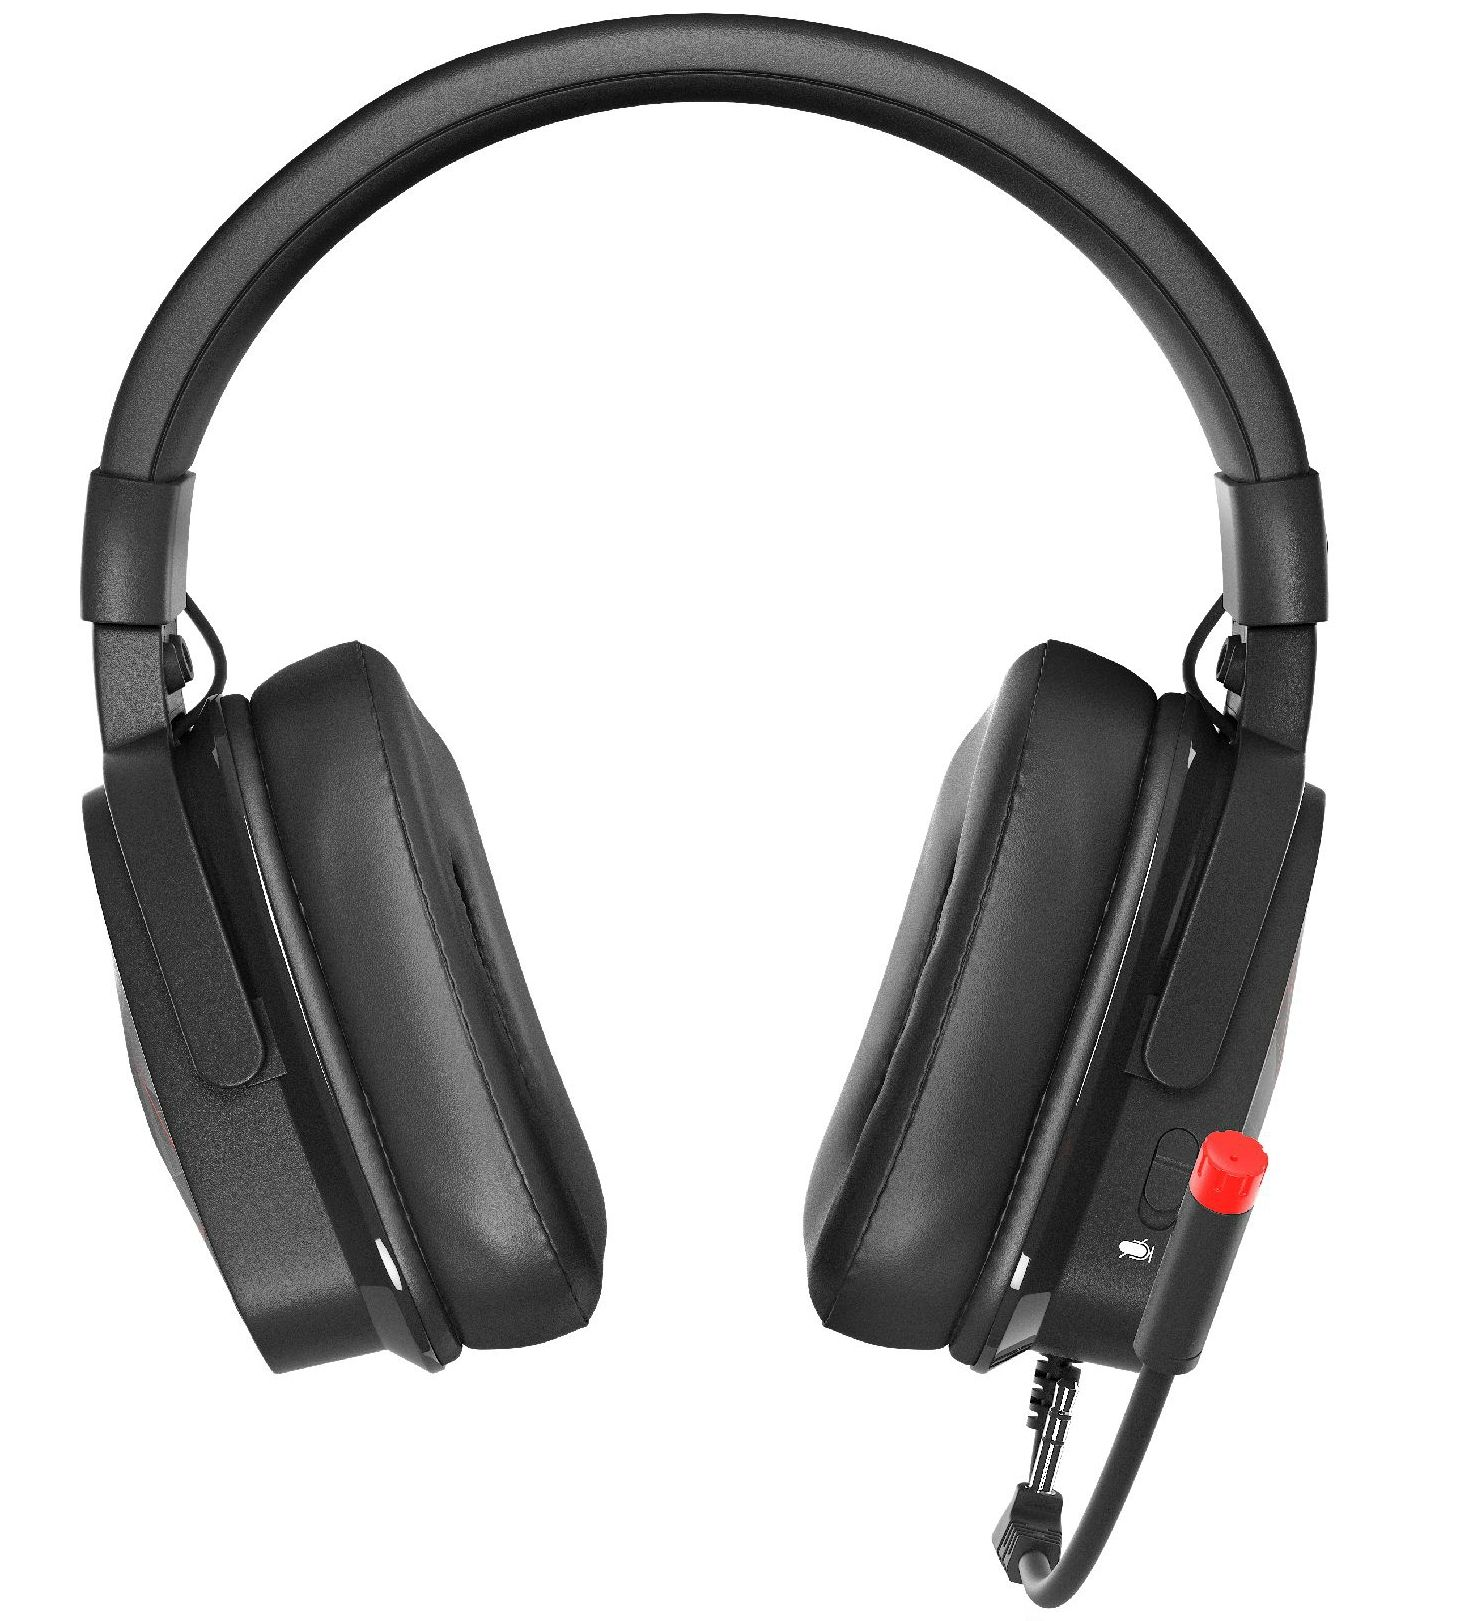 Гейминг слушалки с микрофон Genesis - Argon 570, черни - 2